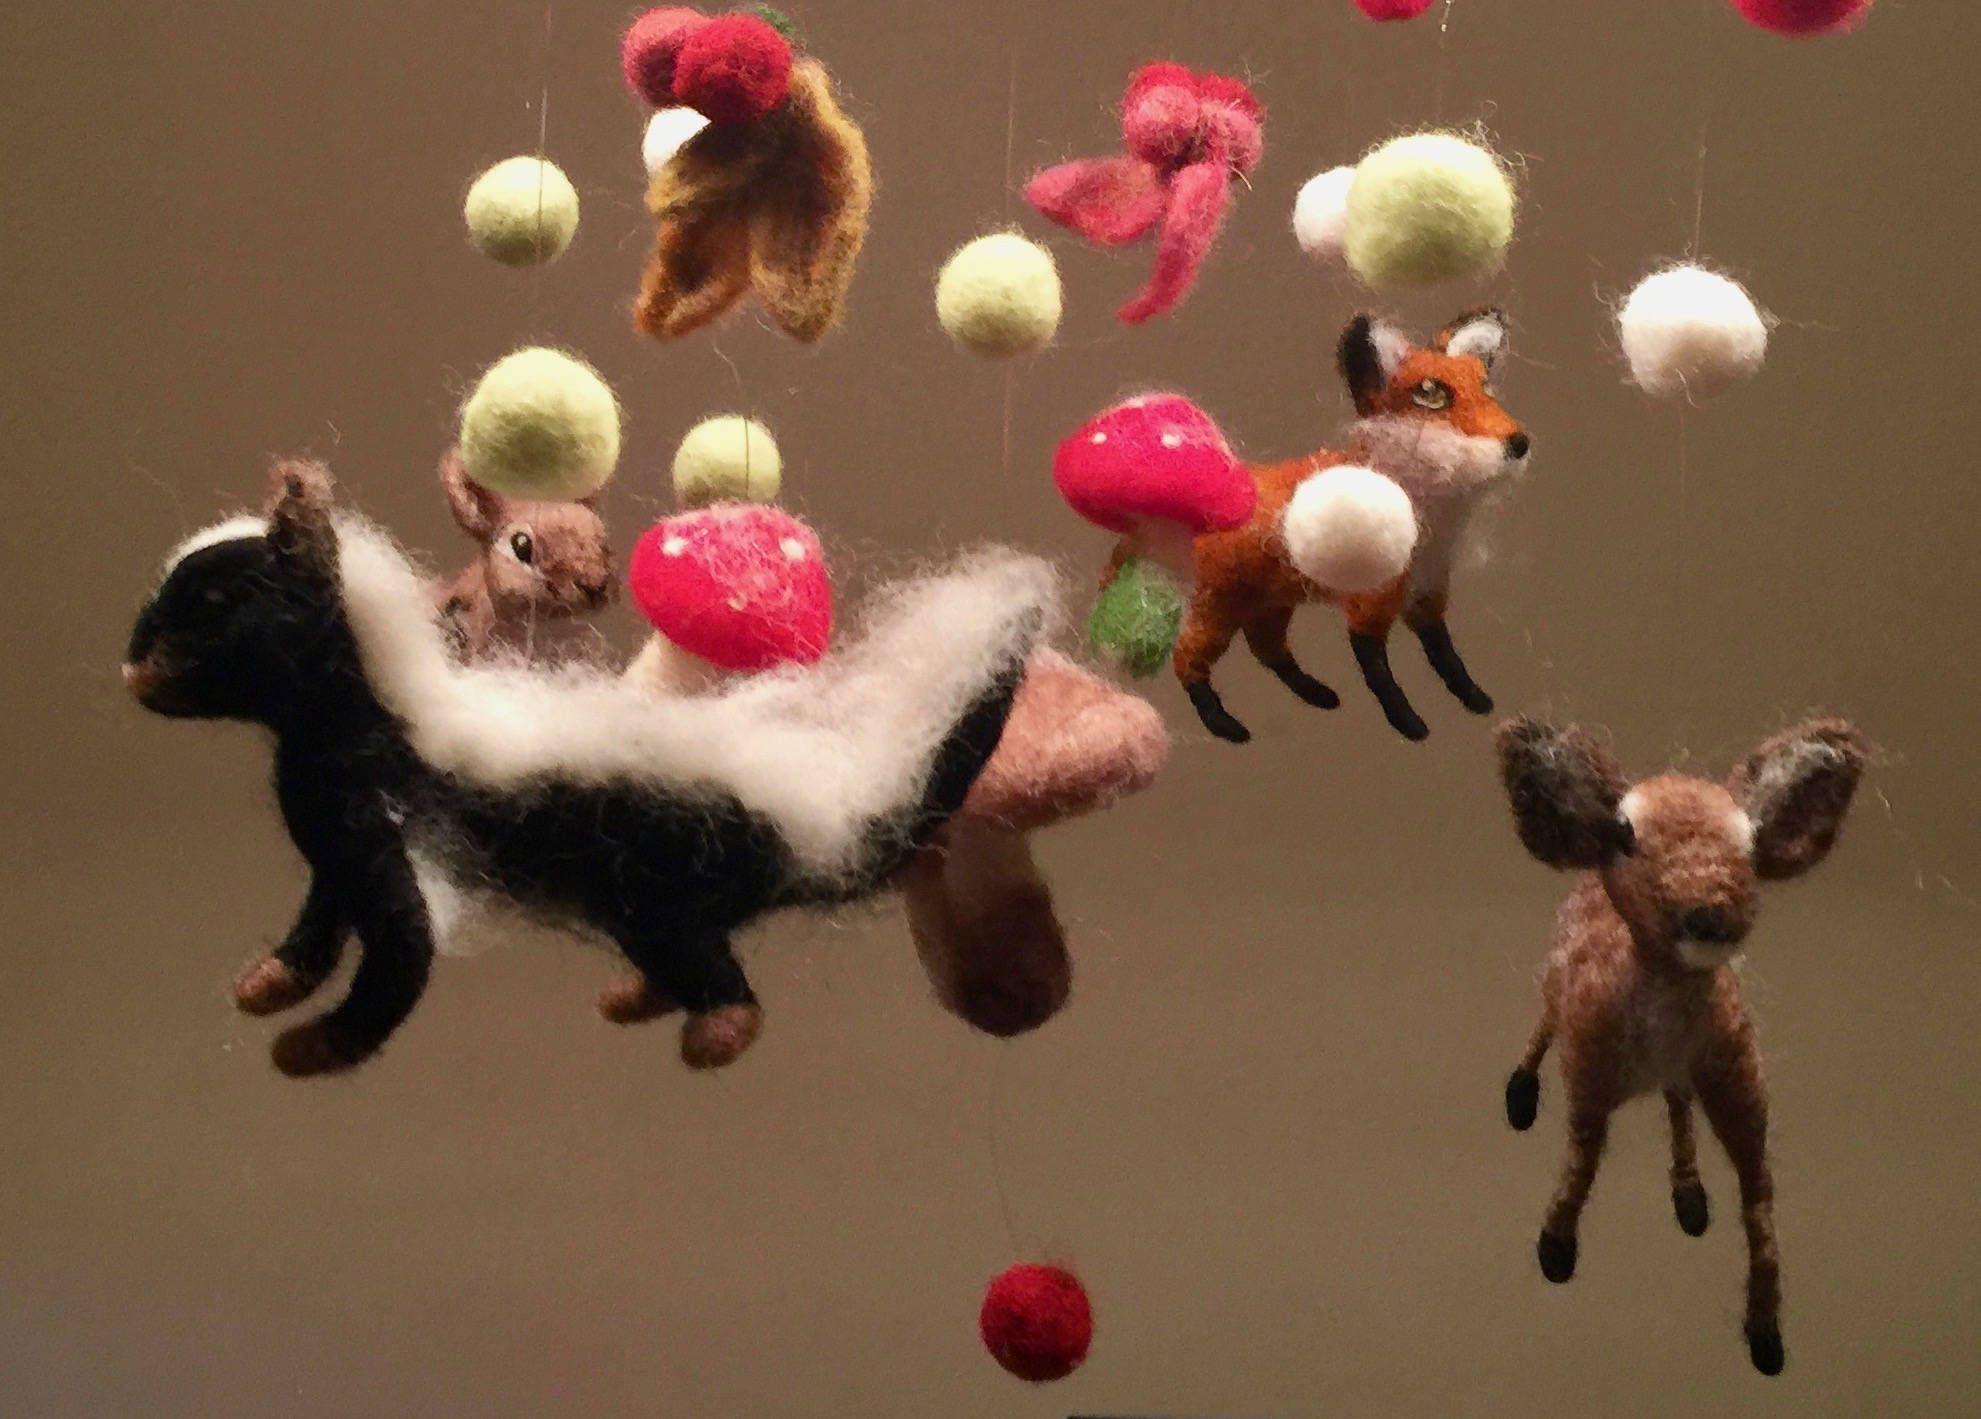 Magica Mobili ~ Móvil bosque encantado móvil decoración decoración infantil